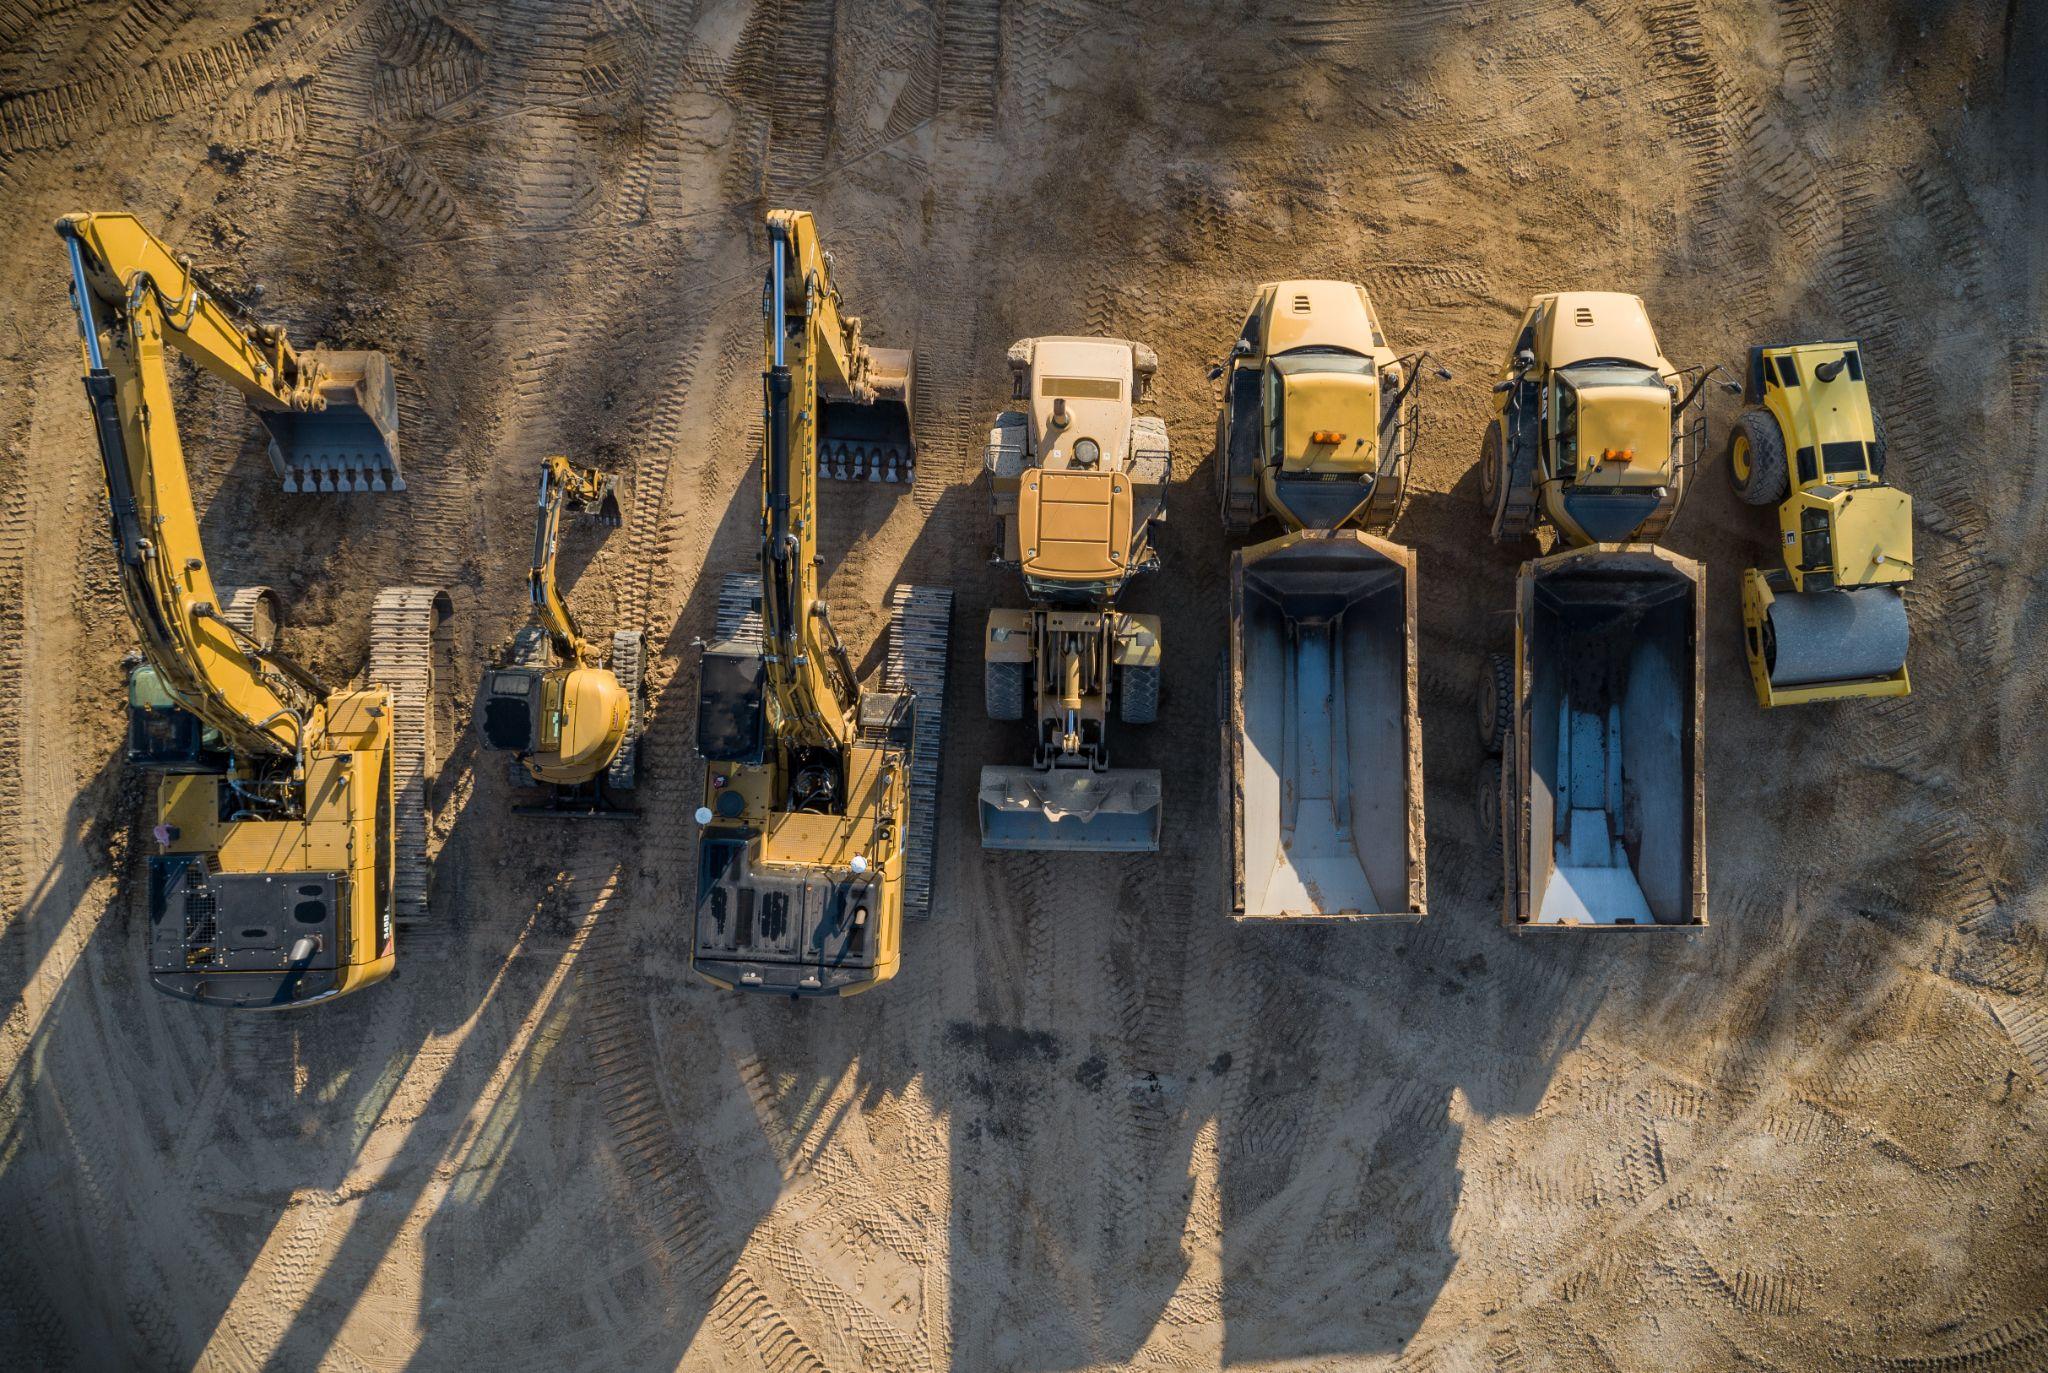 Overhead shot of various construction equipment